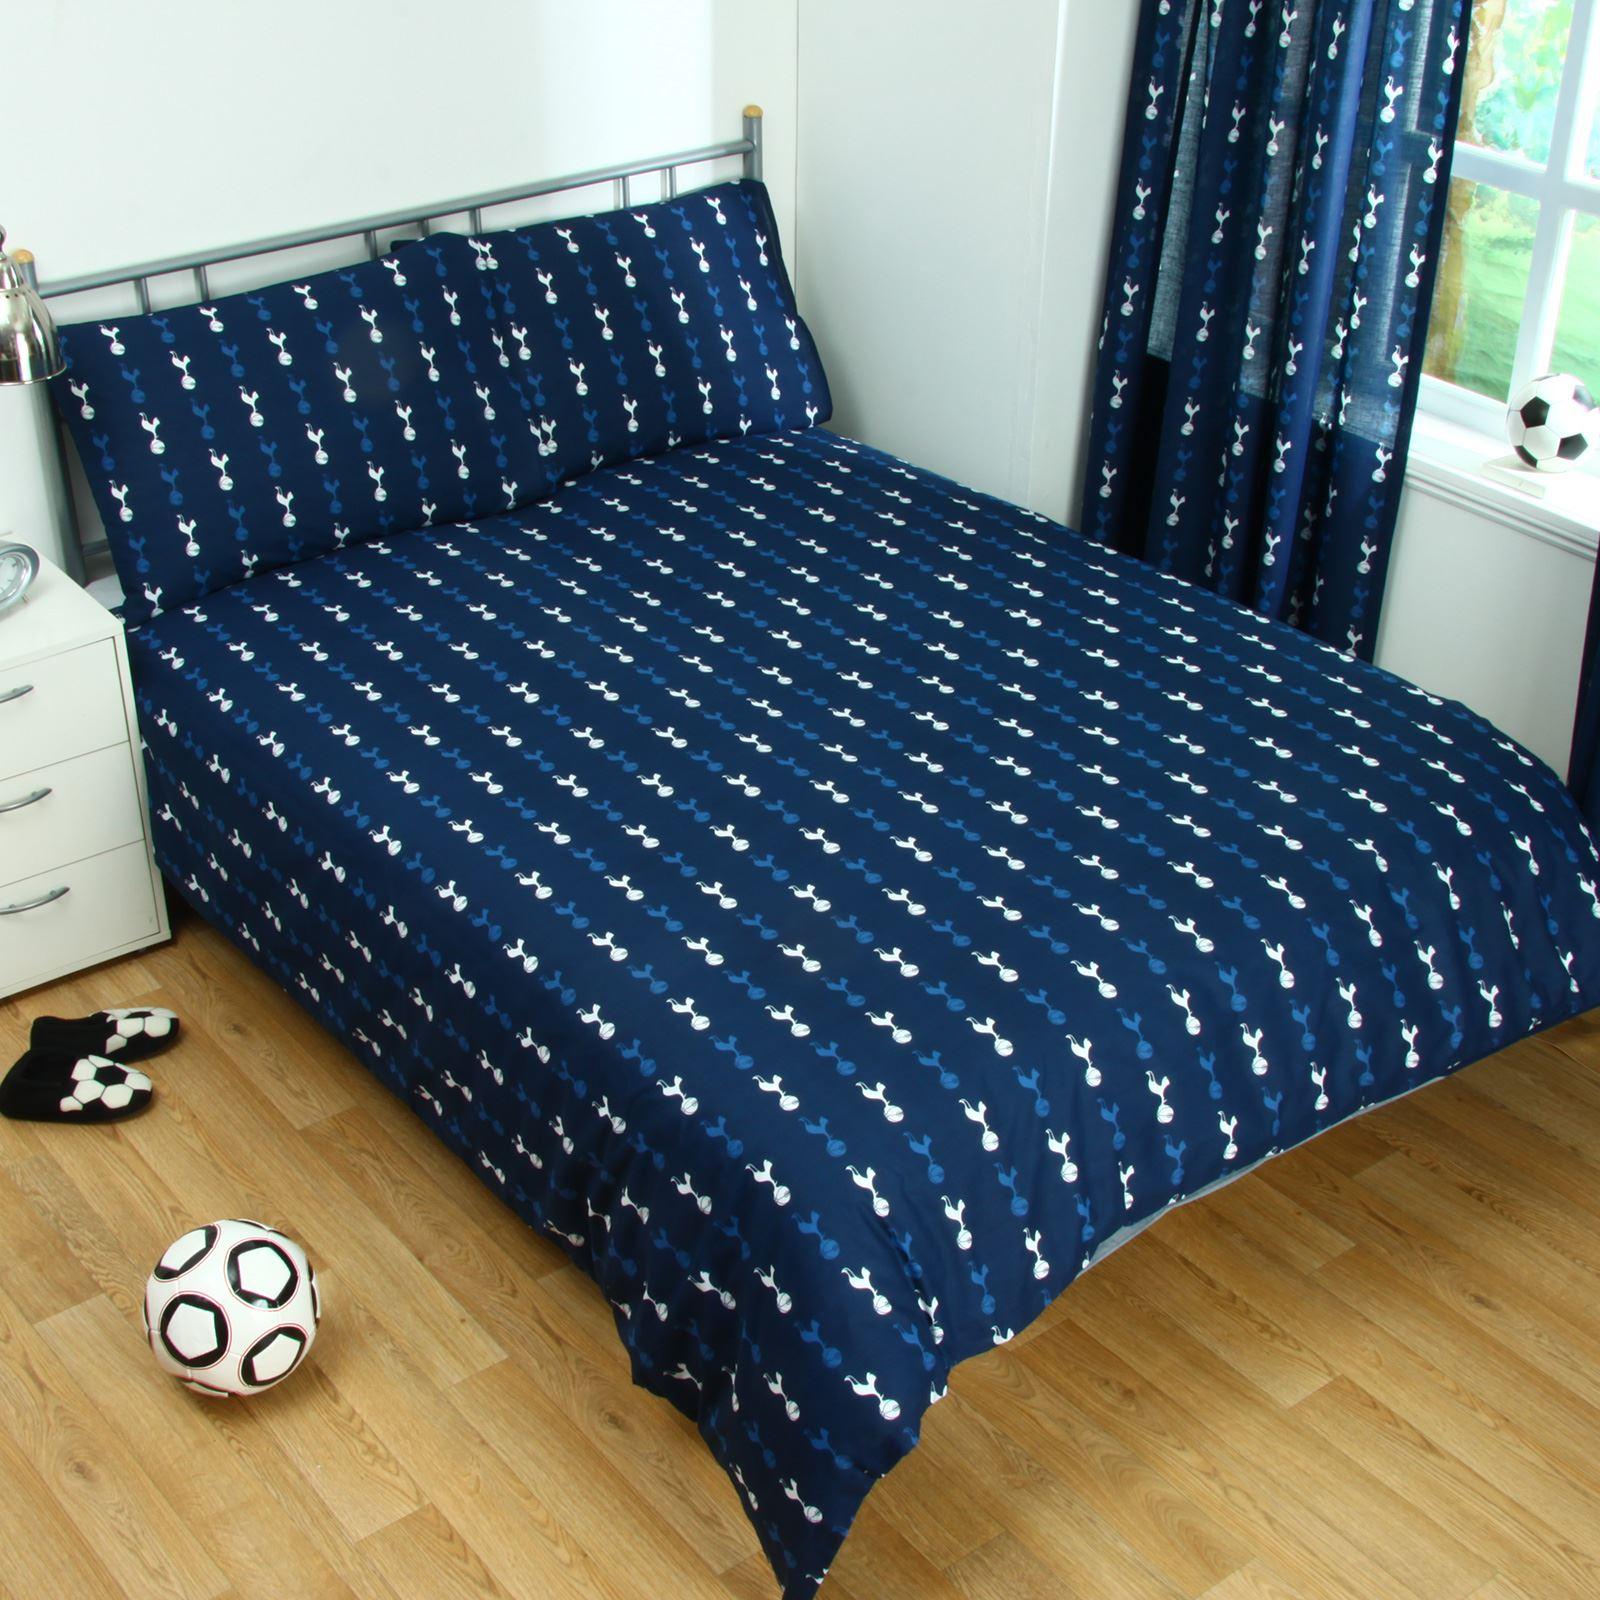 Duvet Cover Tottenham Hotspur Fc Pulse Doppel Bettbezug Und Kissenbezug Bettwäschegarnituren Möbel & Wohnen